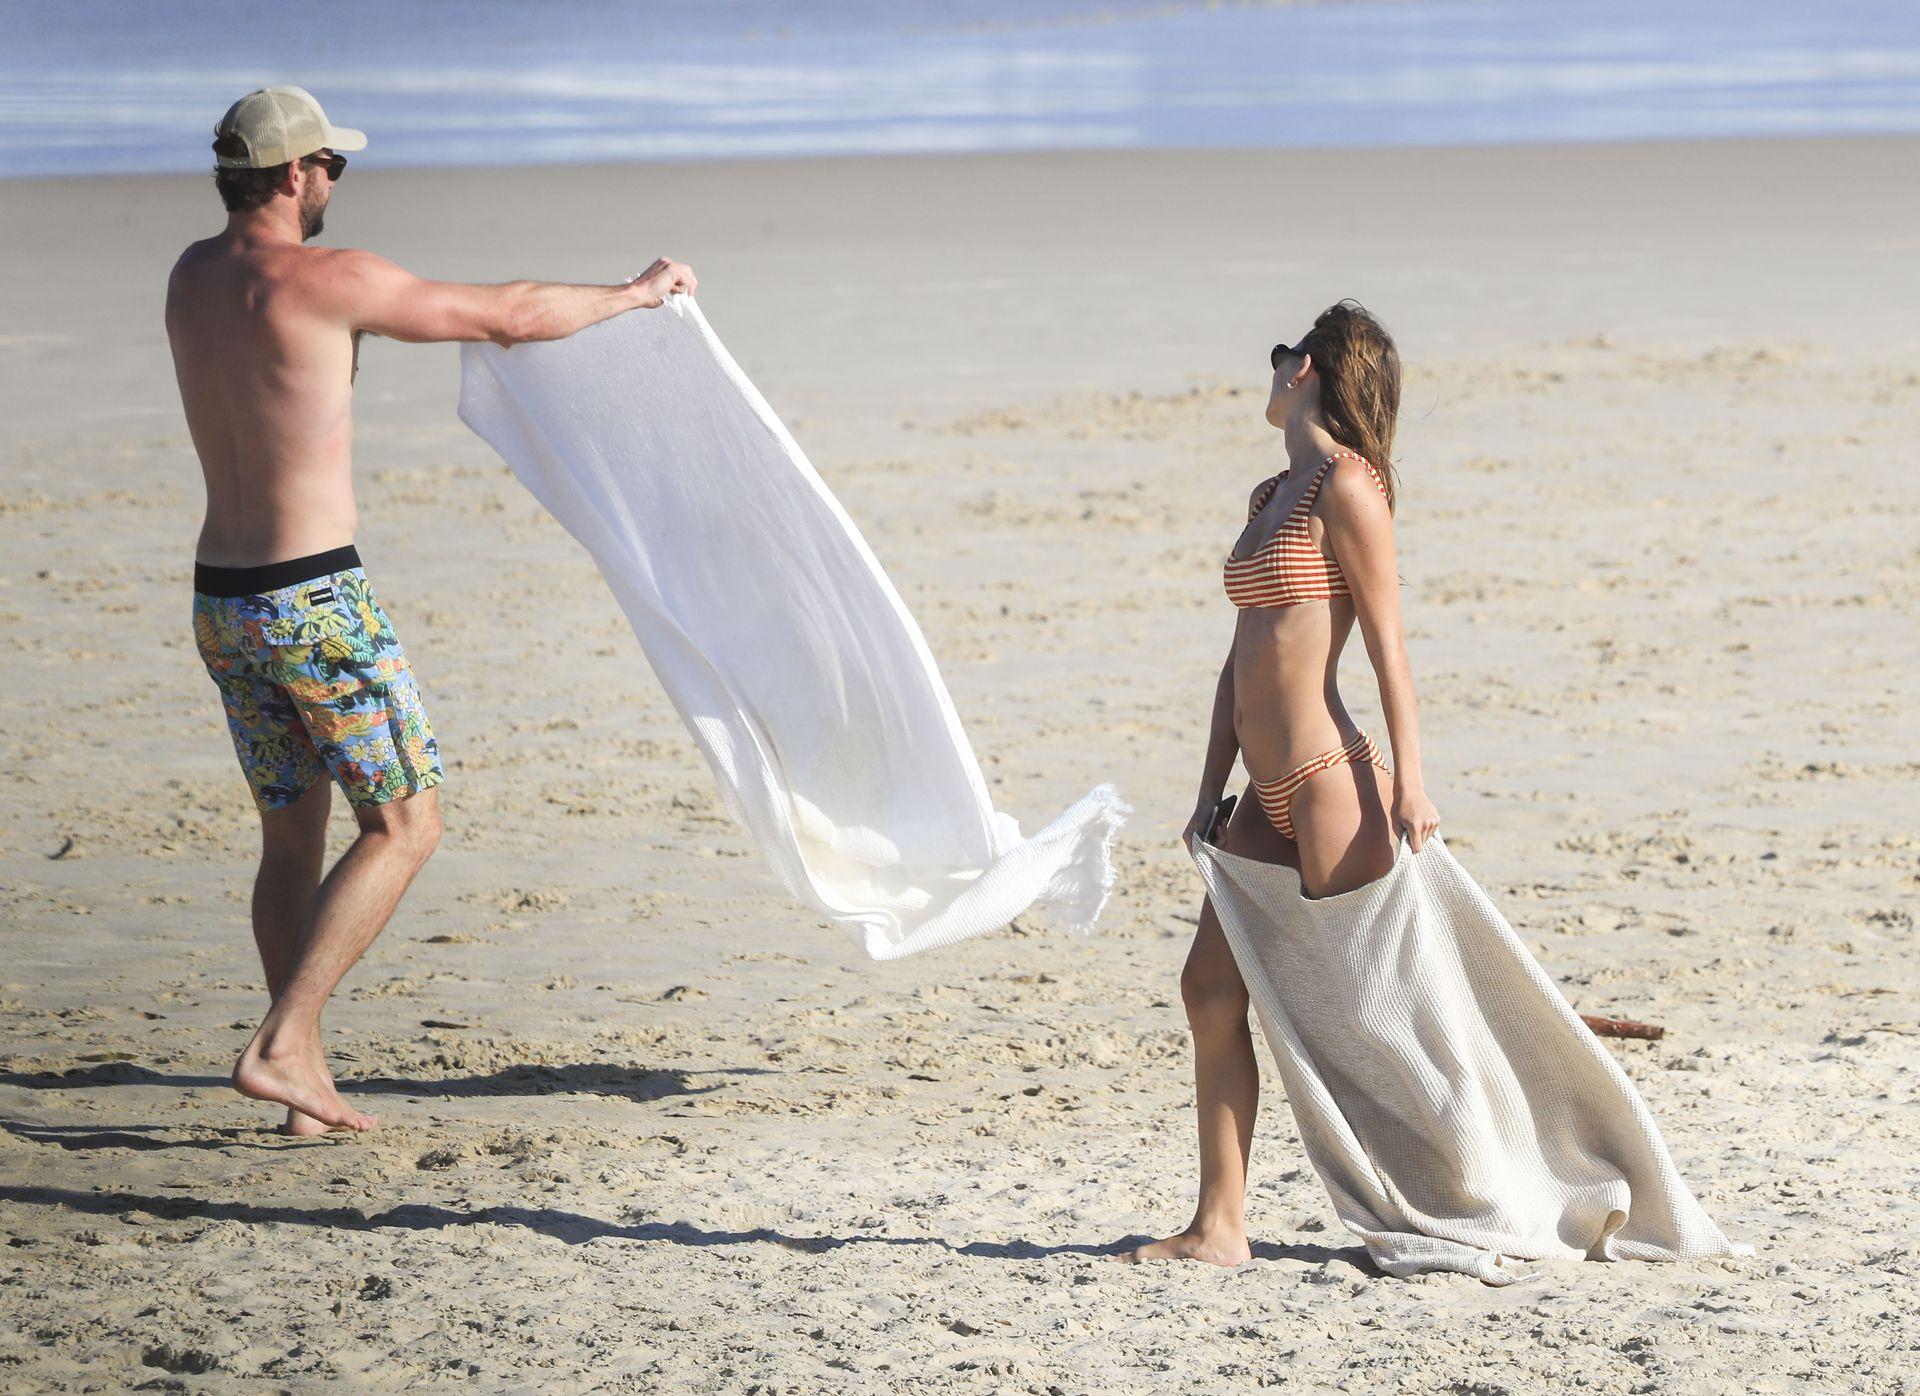 Gabriella Brooks Hot – Liam Hemsworth's New Girlfriend 0055